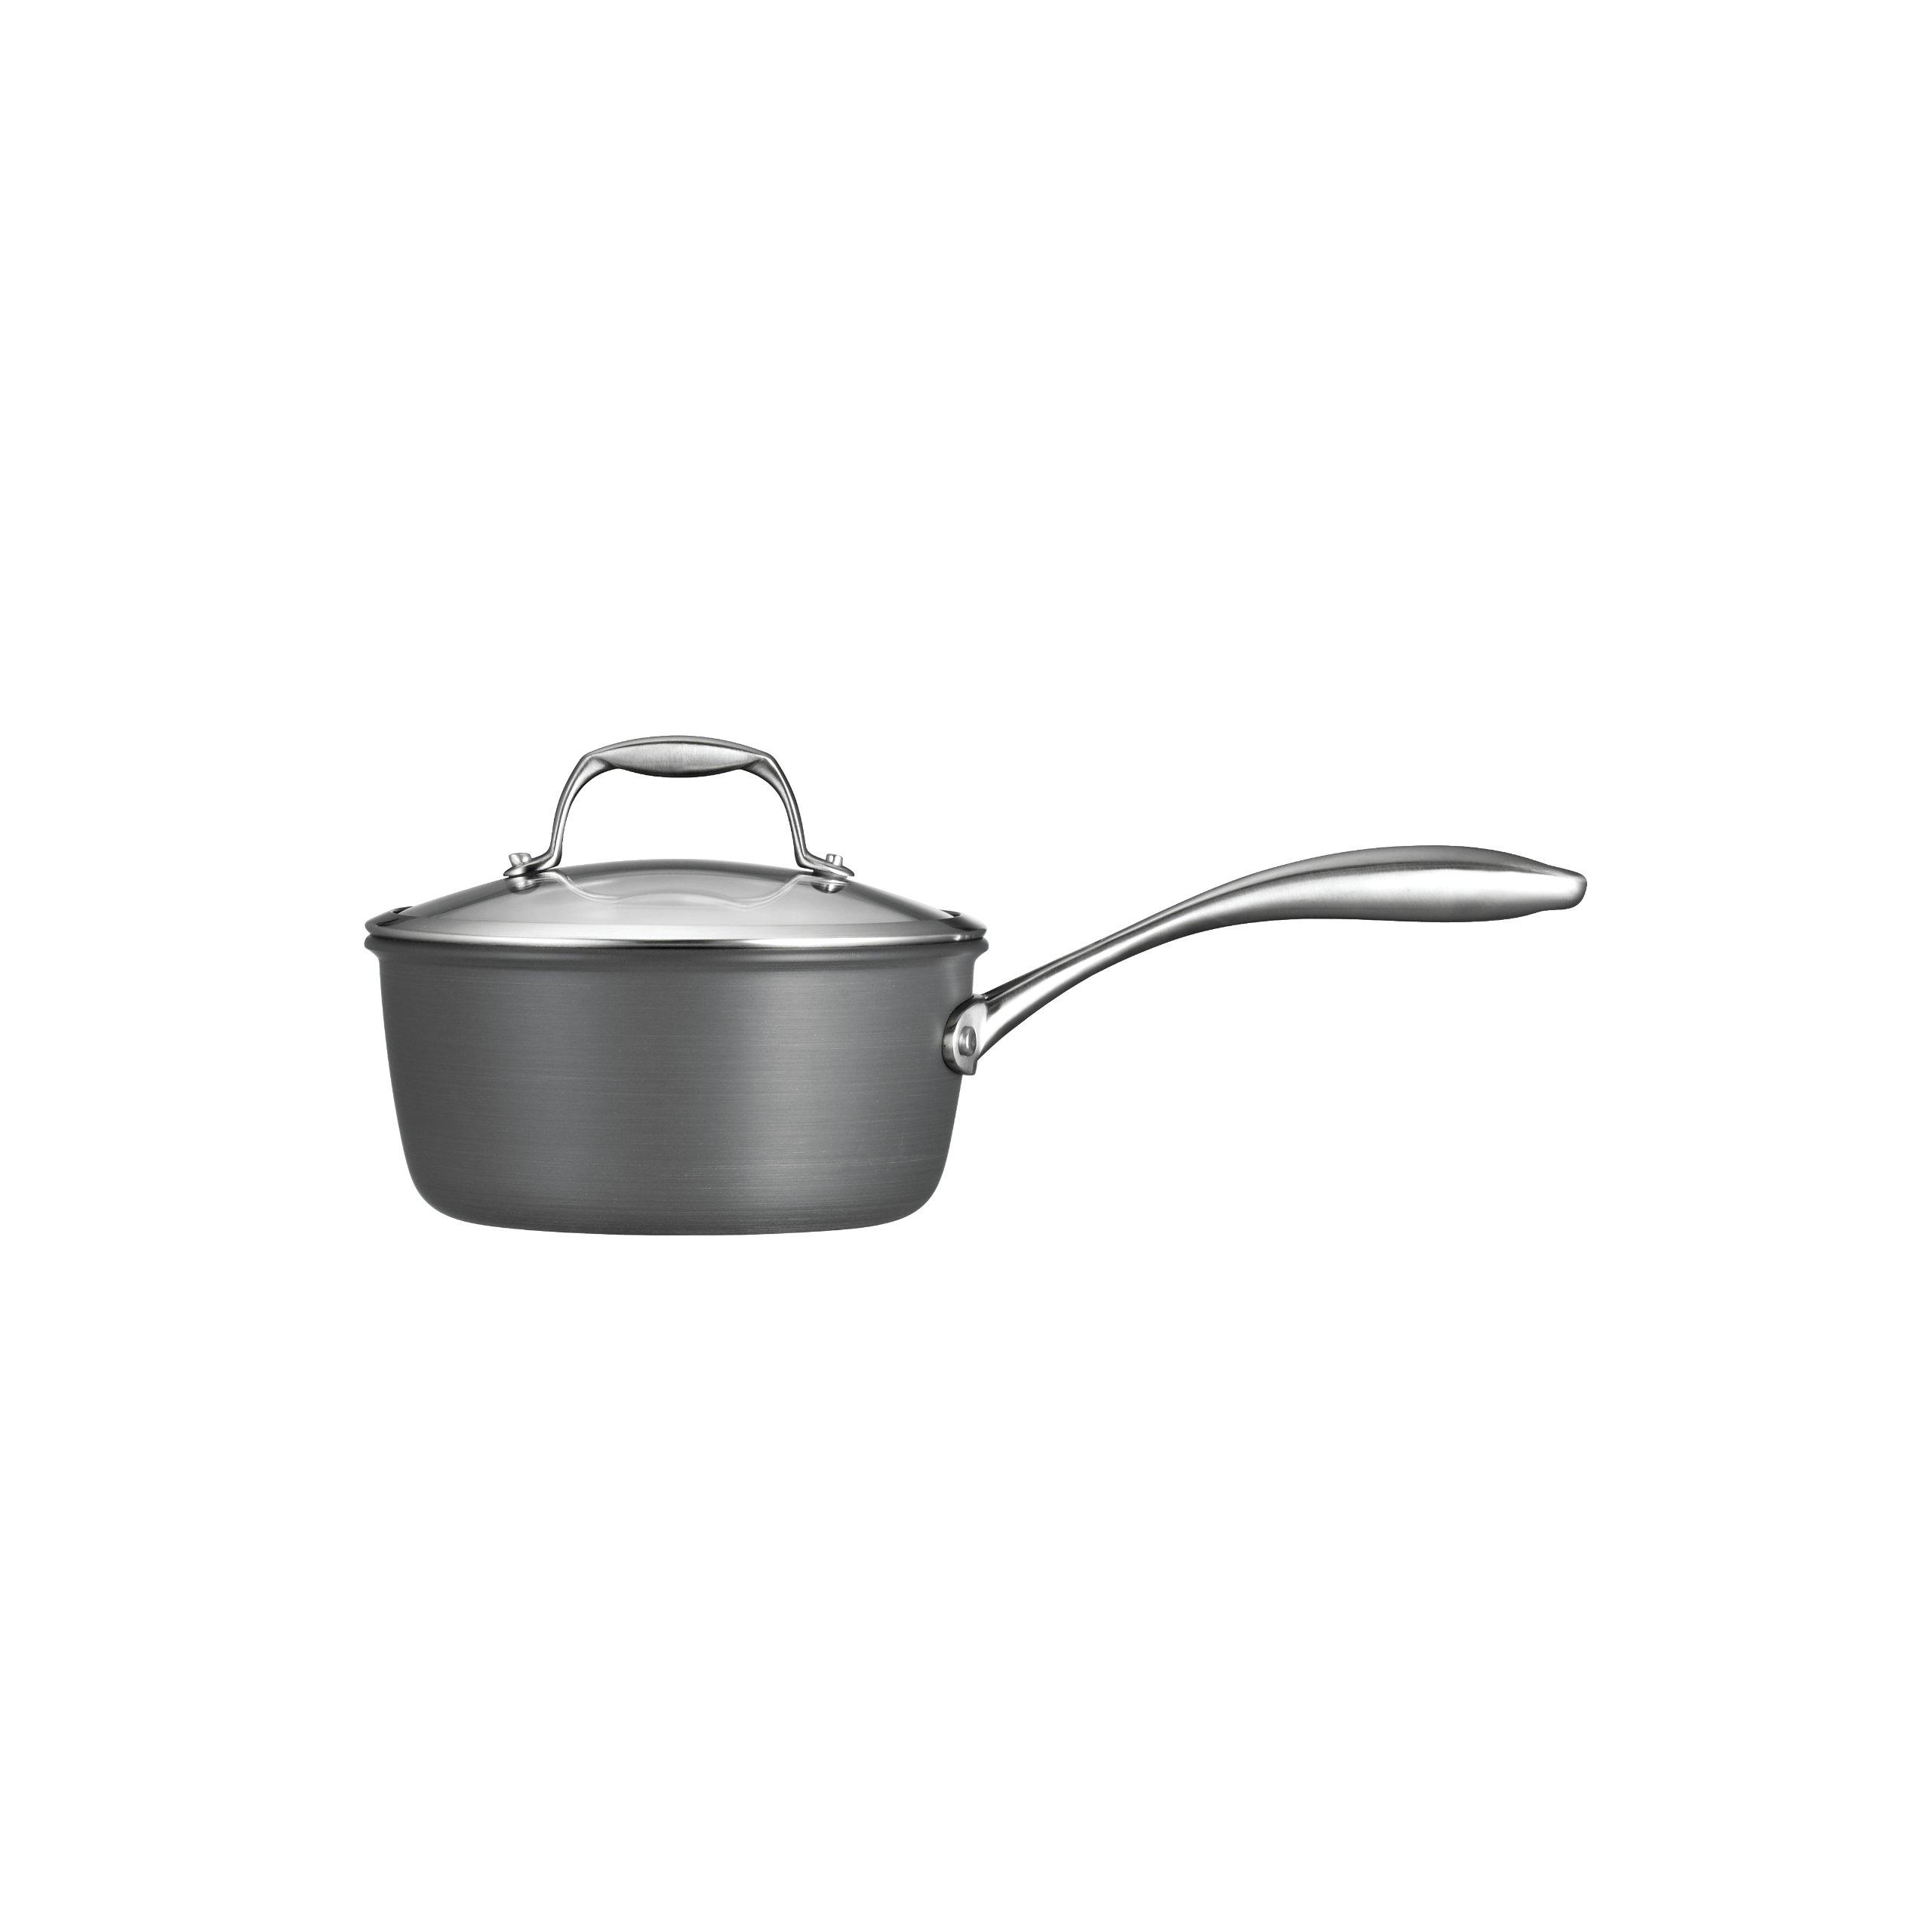 Tramontina  80123/011DS Gourmet Heavy-Gauge Aluminum Nonstick Covered Sauce Pan, 2-Quart, Hard Anodized